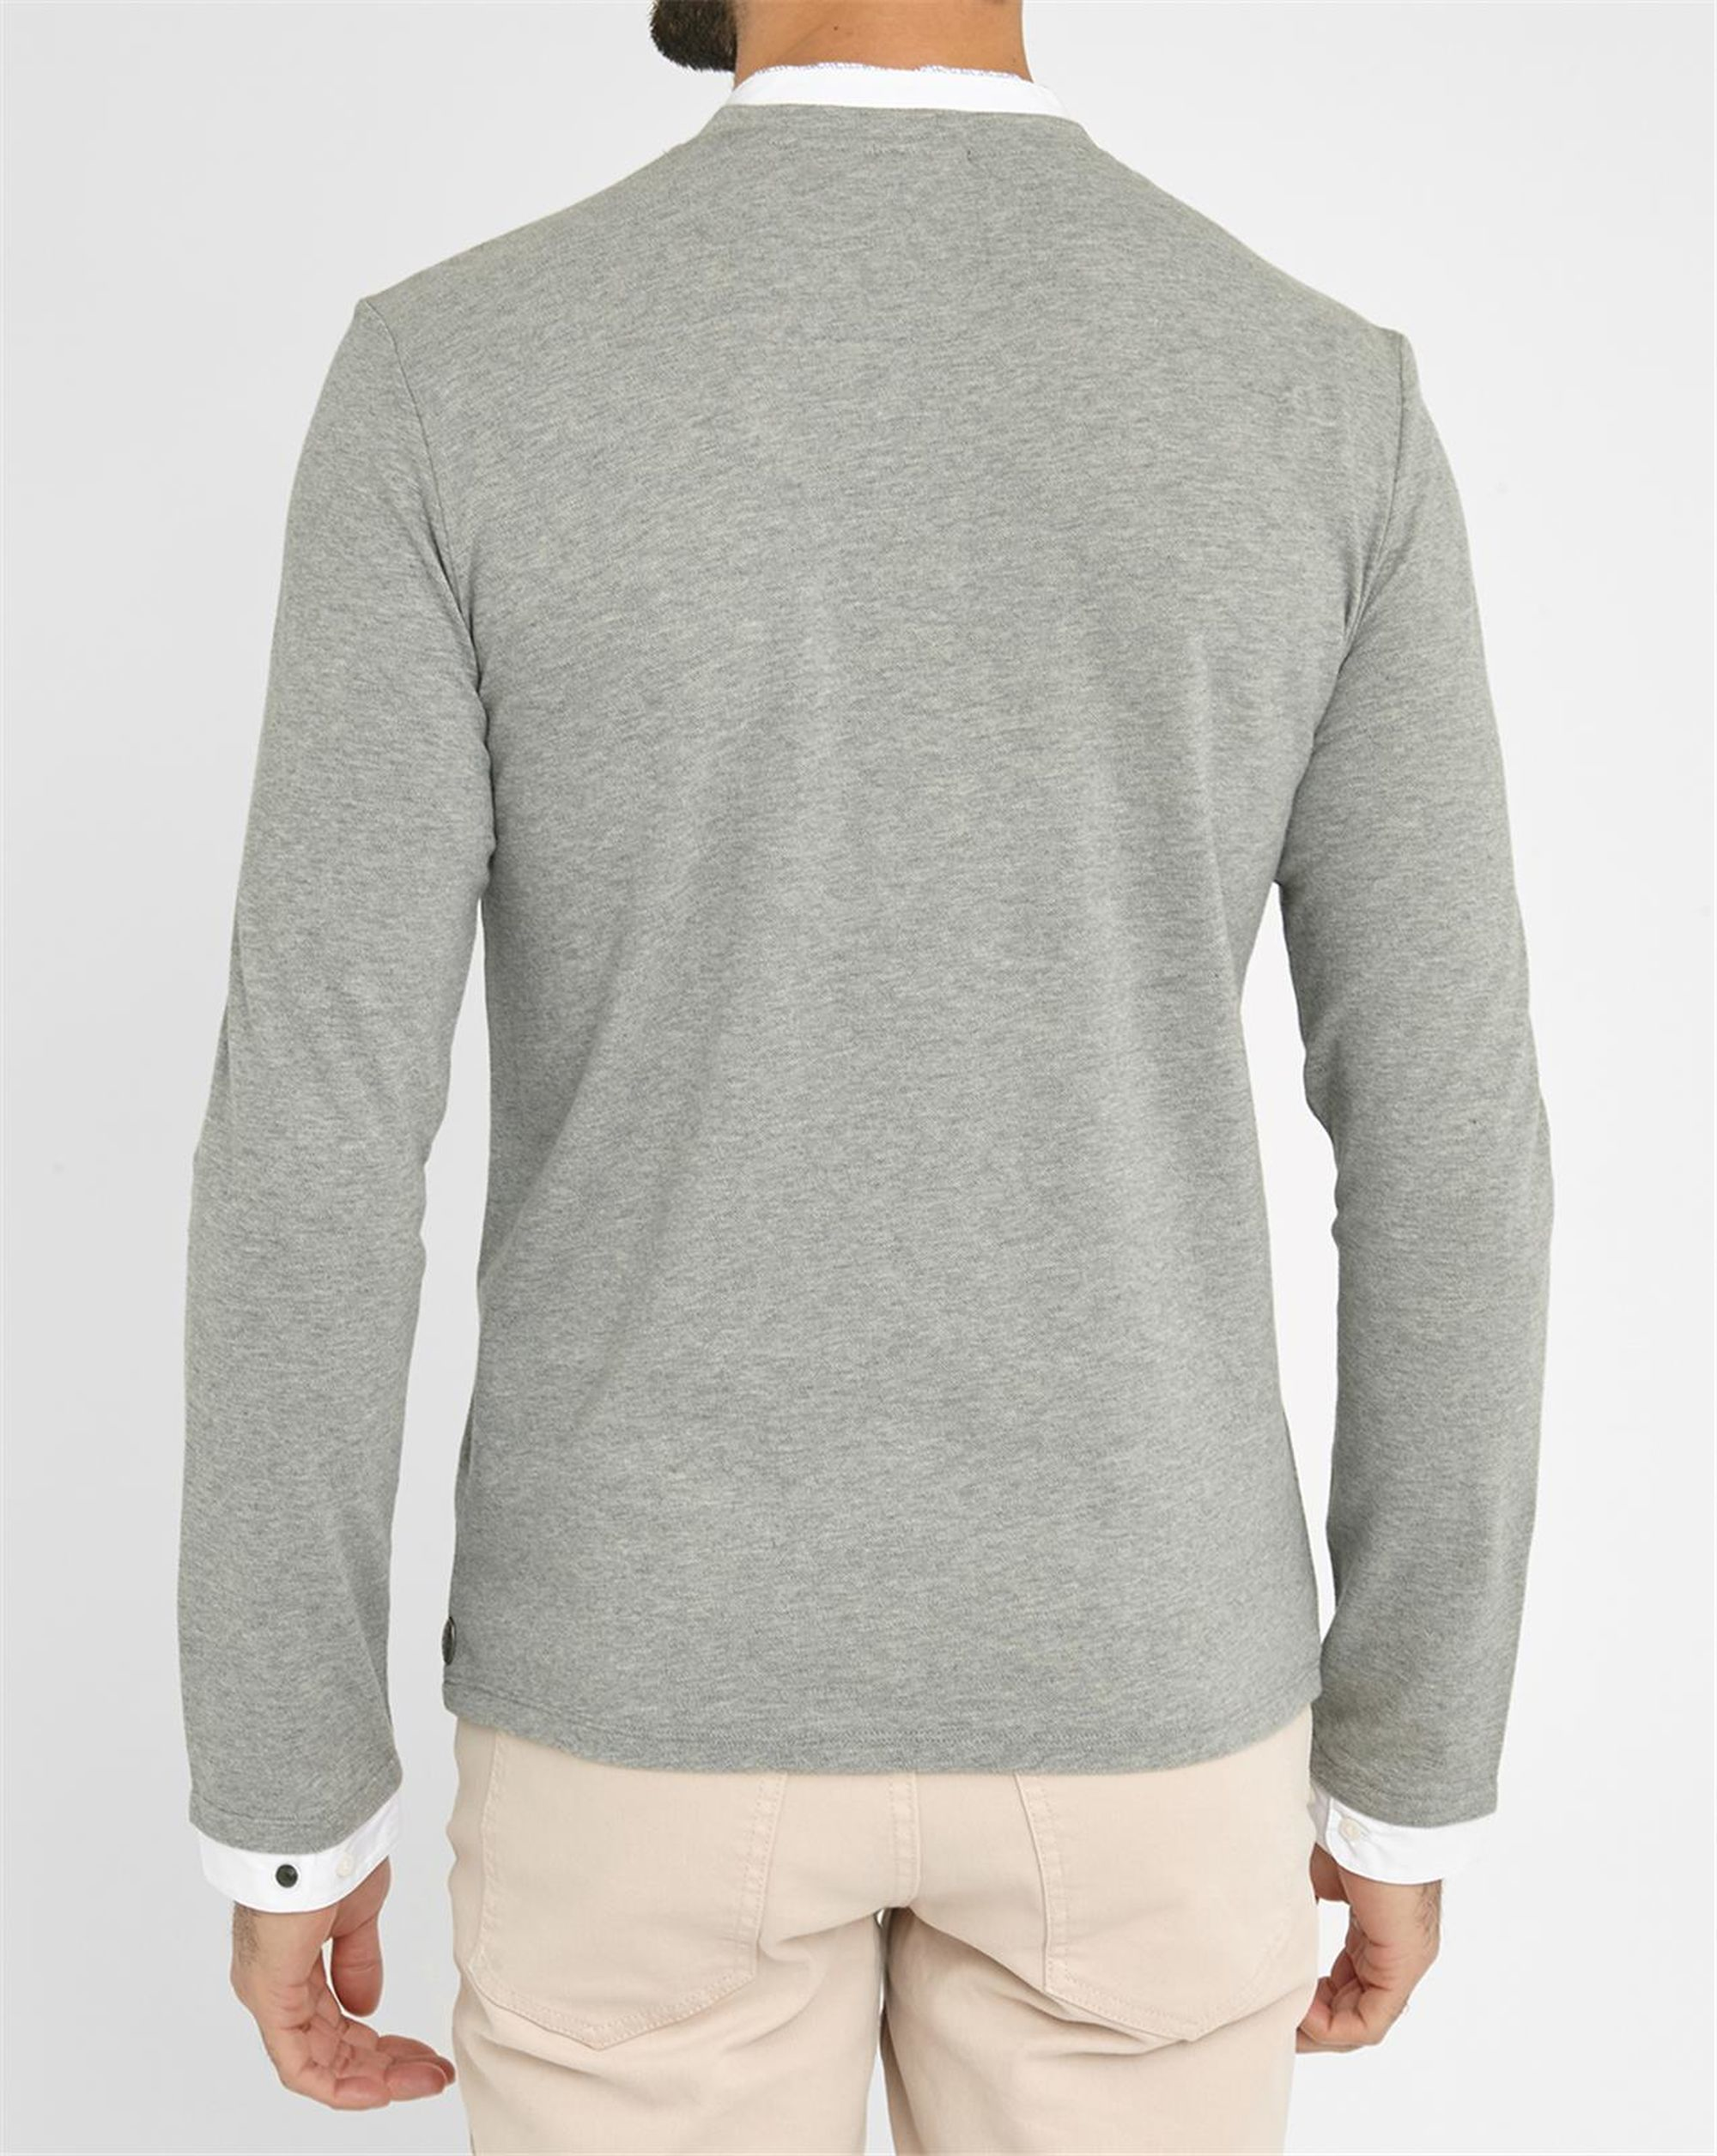 ikks grey ls grandad collar lined polo shirt in gray for men lyst. Black Bedroom Furniture Sets. Home Design Ideas